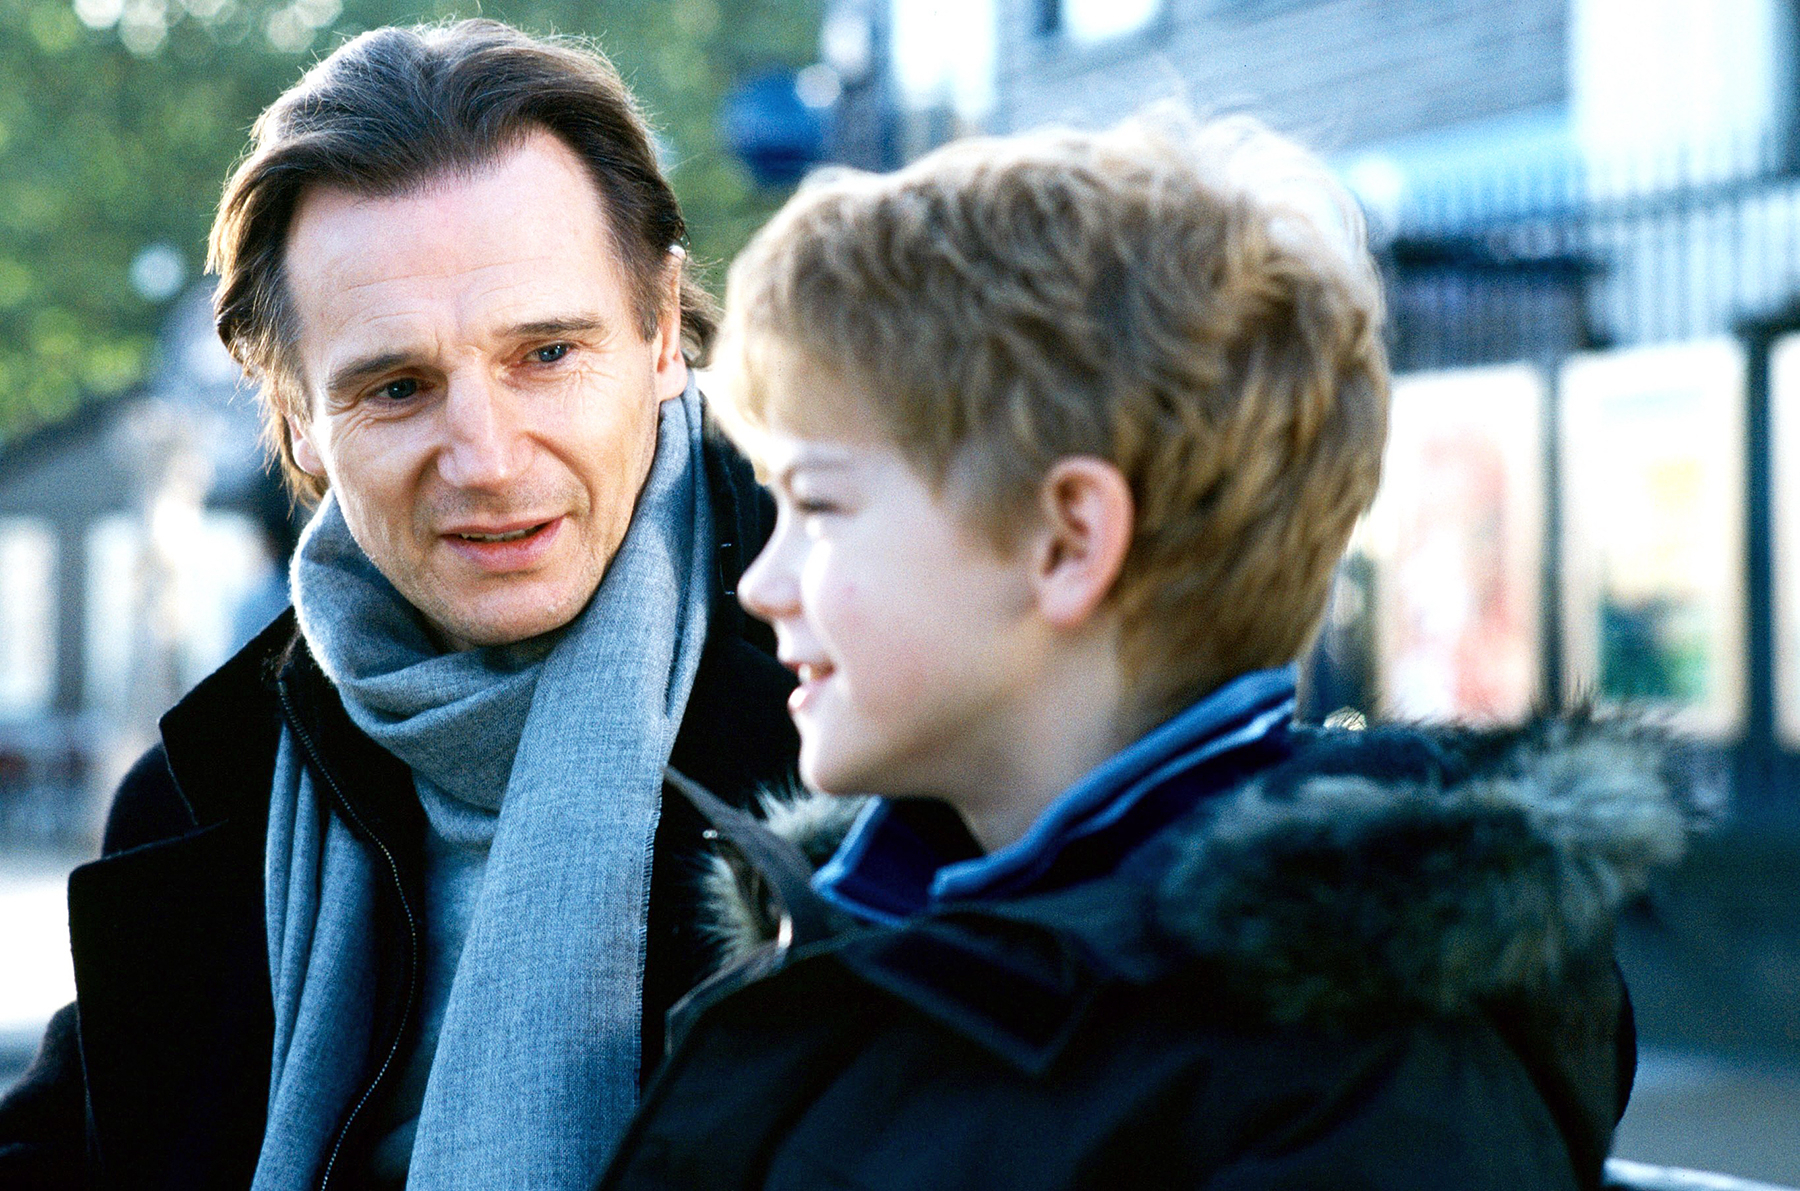 Liam Neeson Thomas Sangster Love Actually